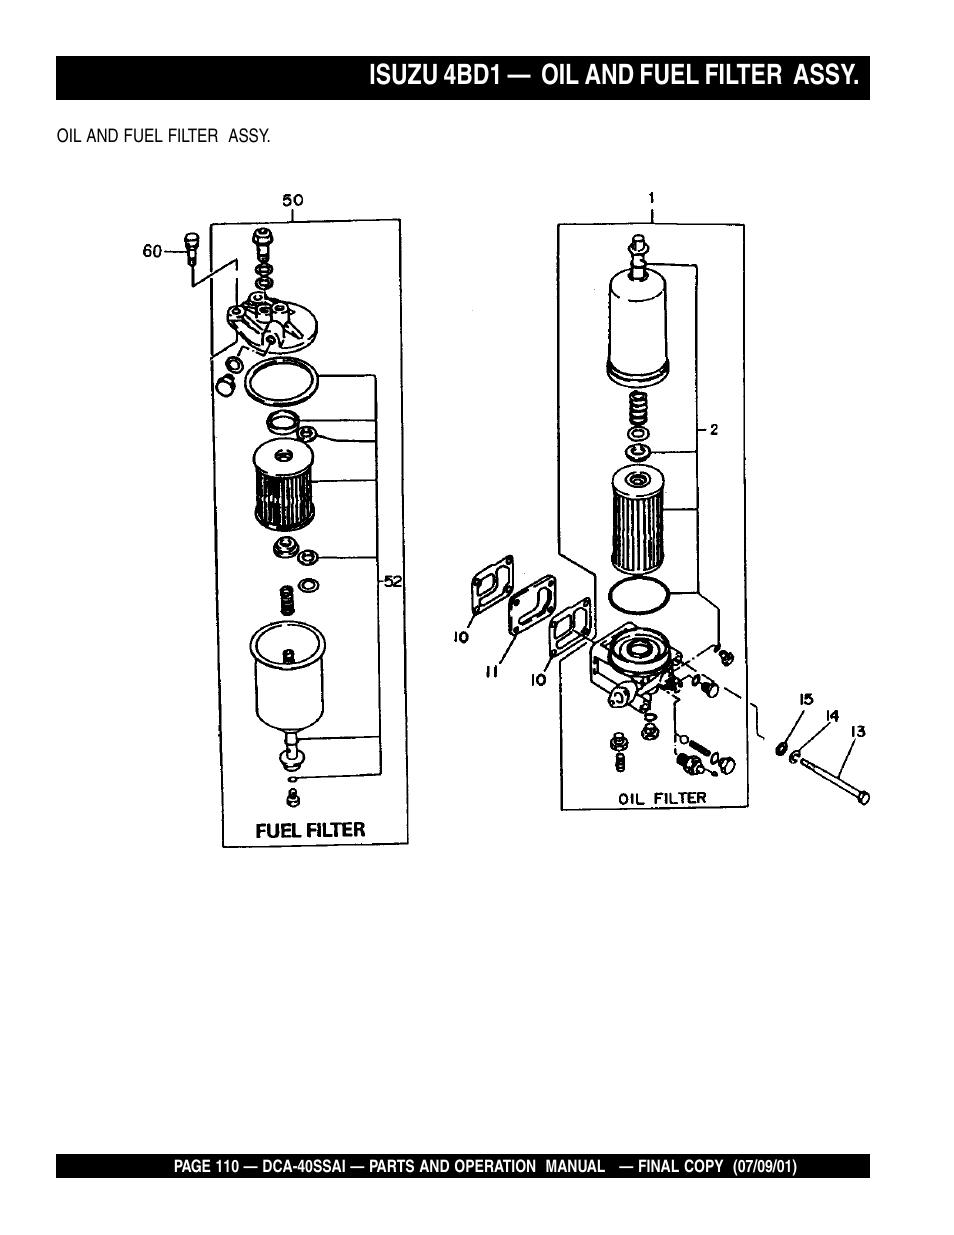 hight resolution of isuzu 4bd1 oil and fuel filter assy multiquip mq power whisperwatttm generator dca 40ssai user manual page 110 140